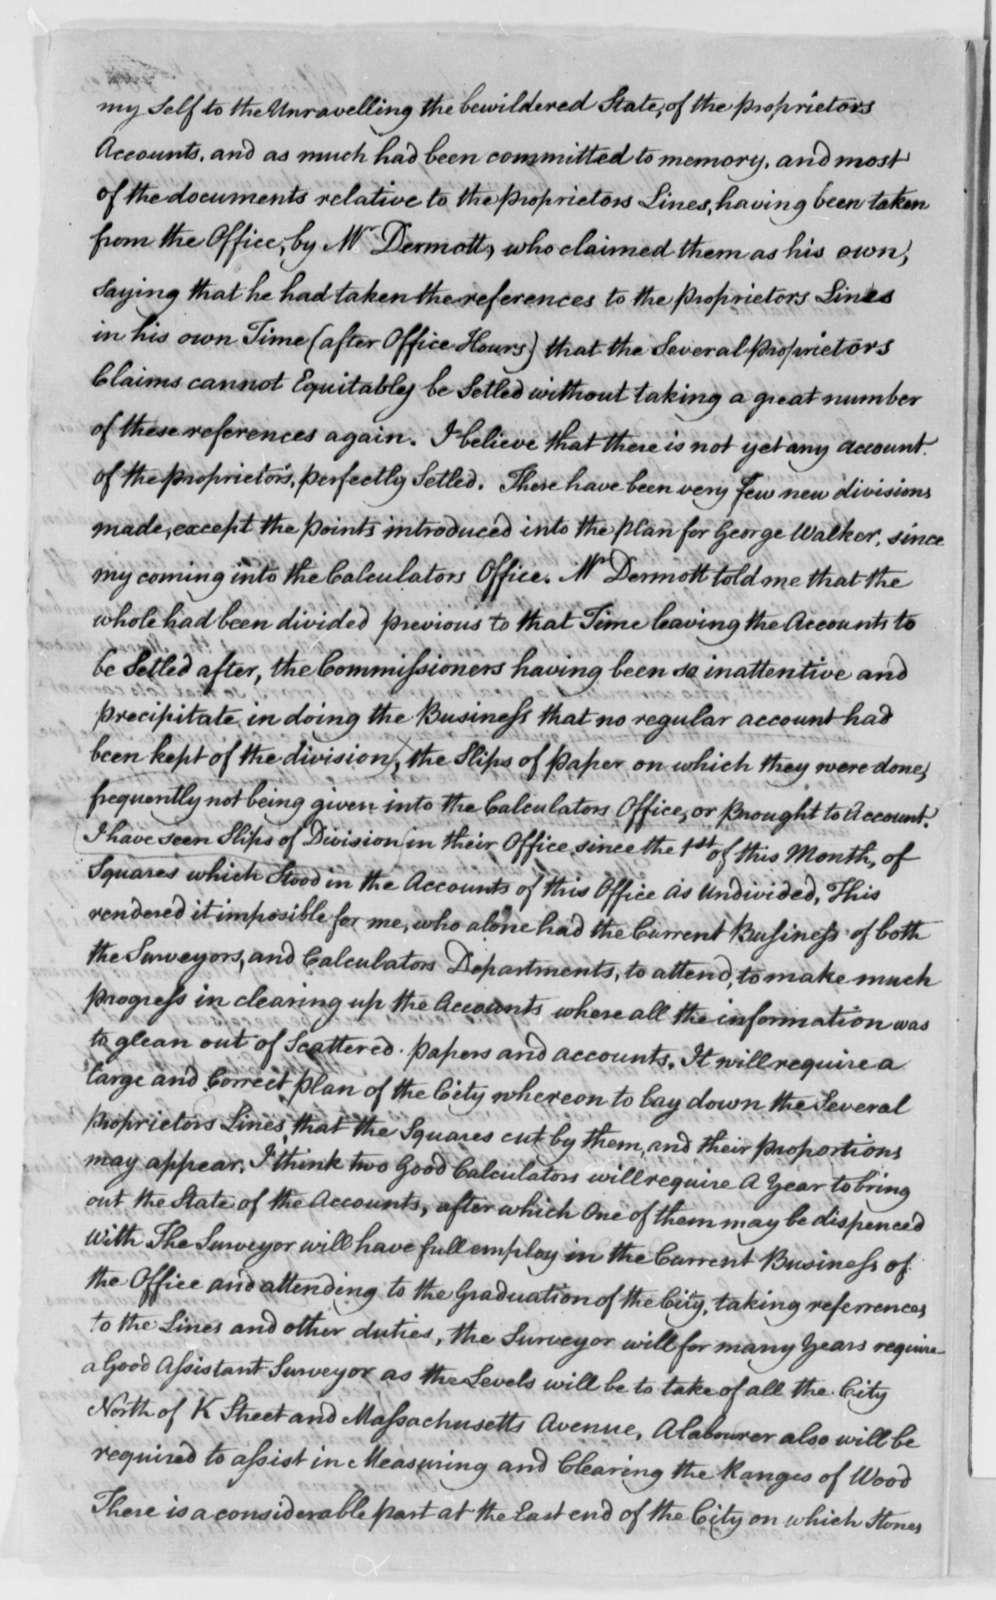 Robert King to Thomas Jefferson, June 5, 1802